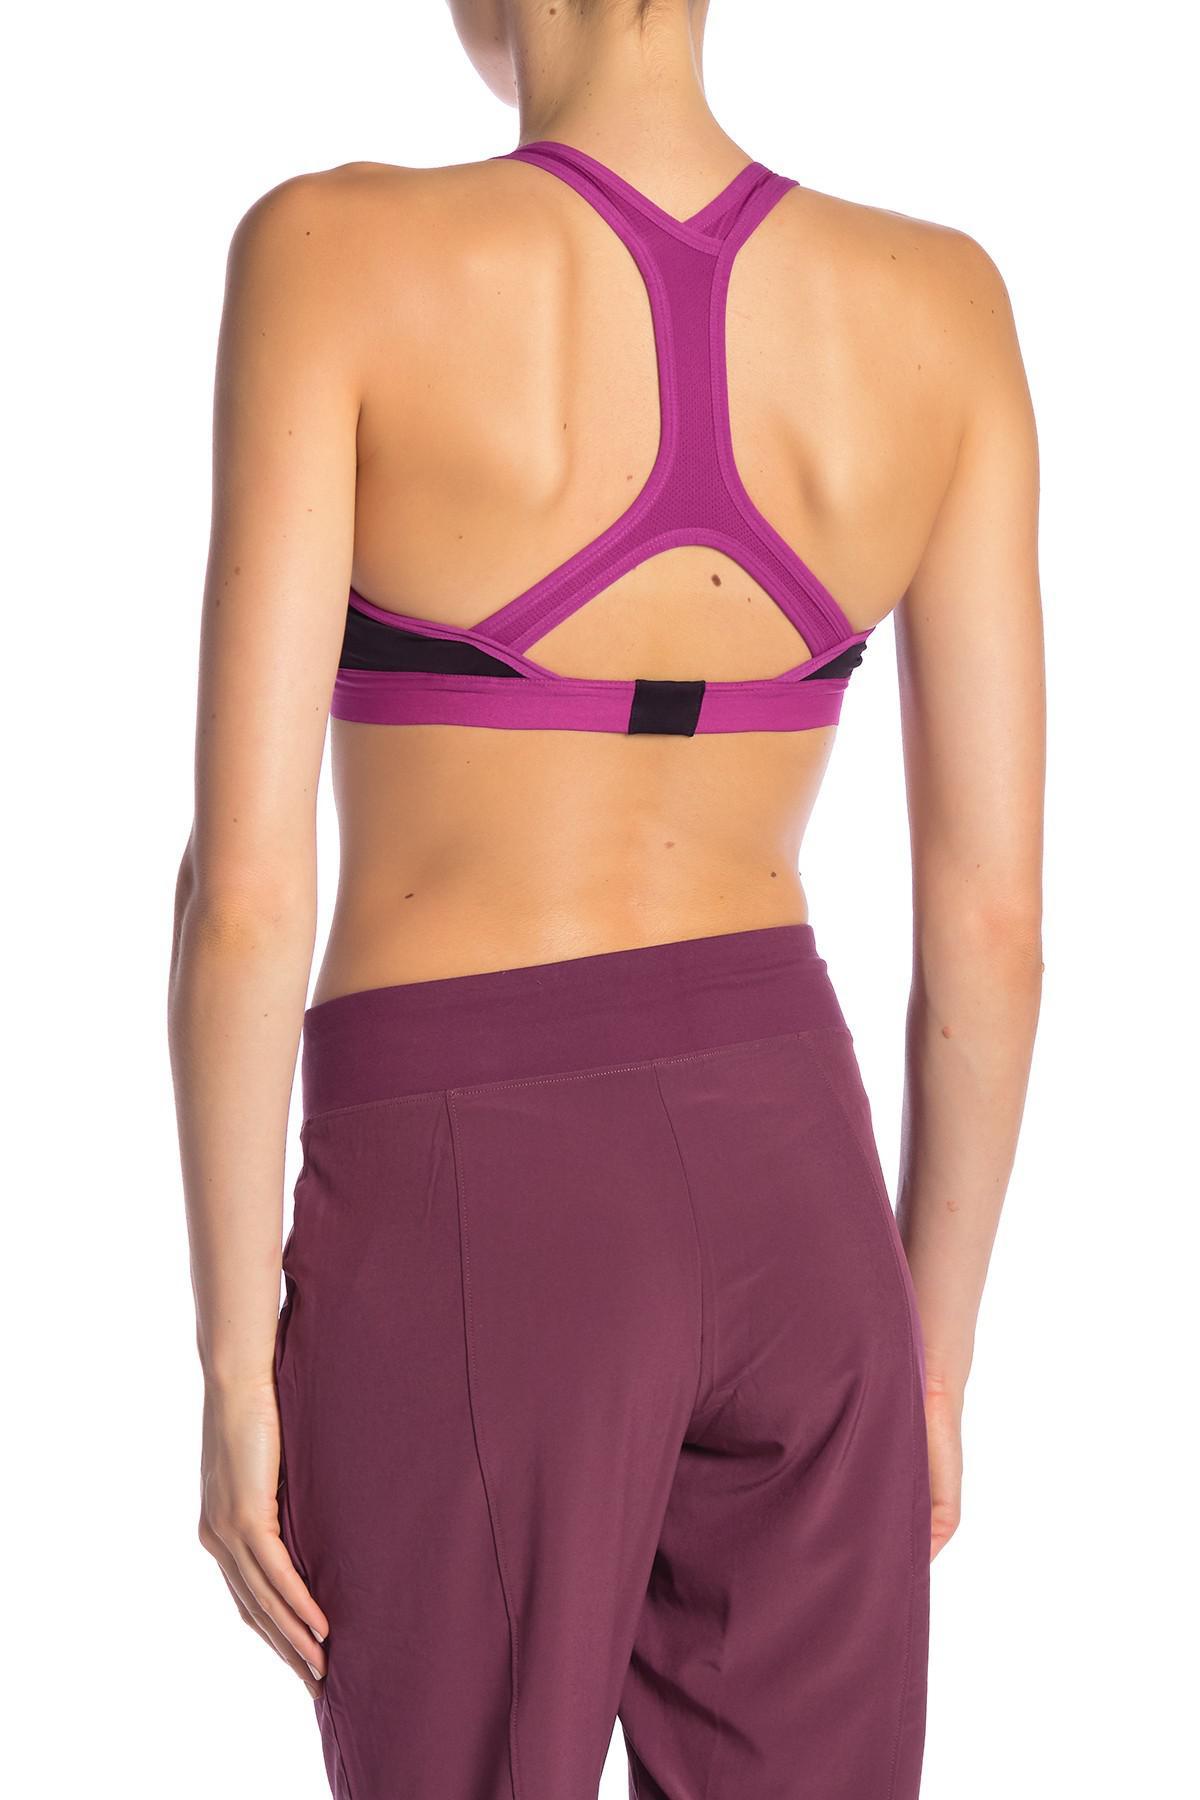 332d19bf3f0e6 The North Face - Purple Stow-n-go Sports Bra - Lyst. View fullscreen